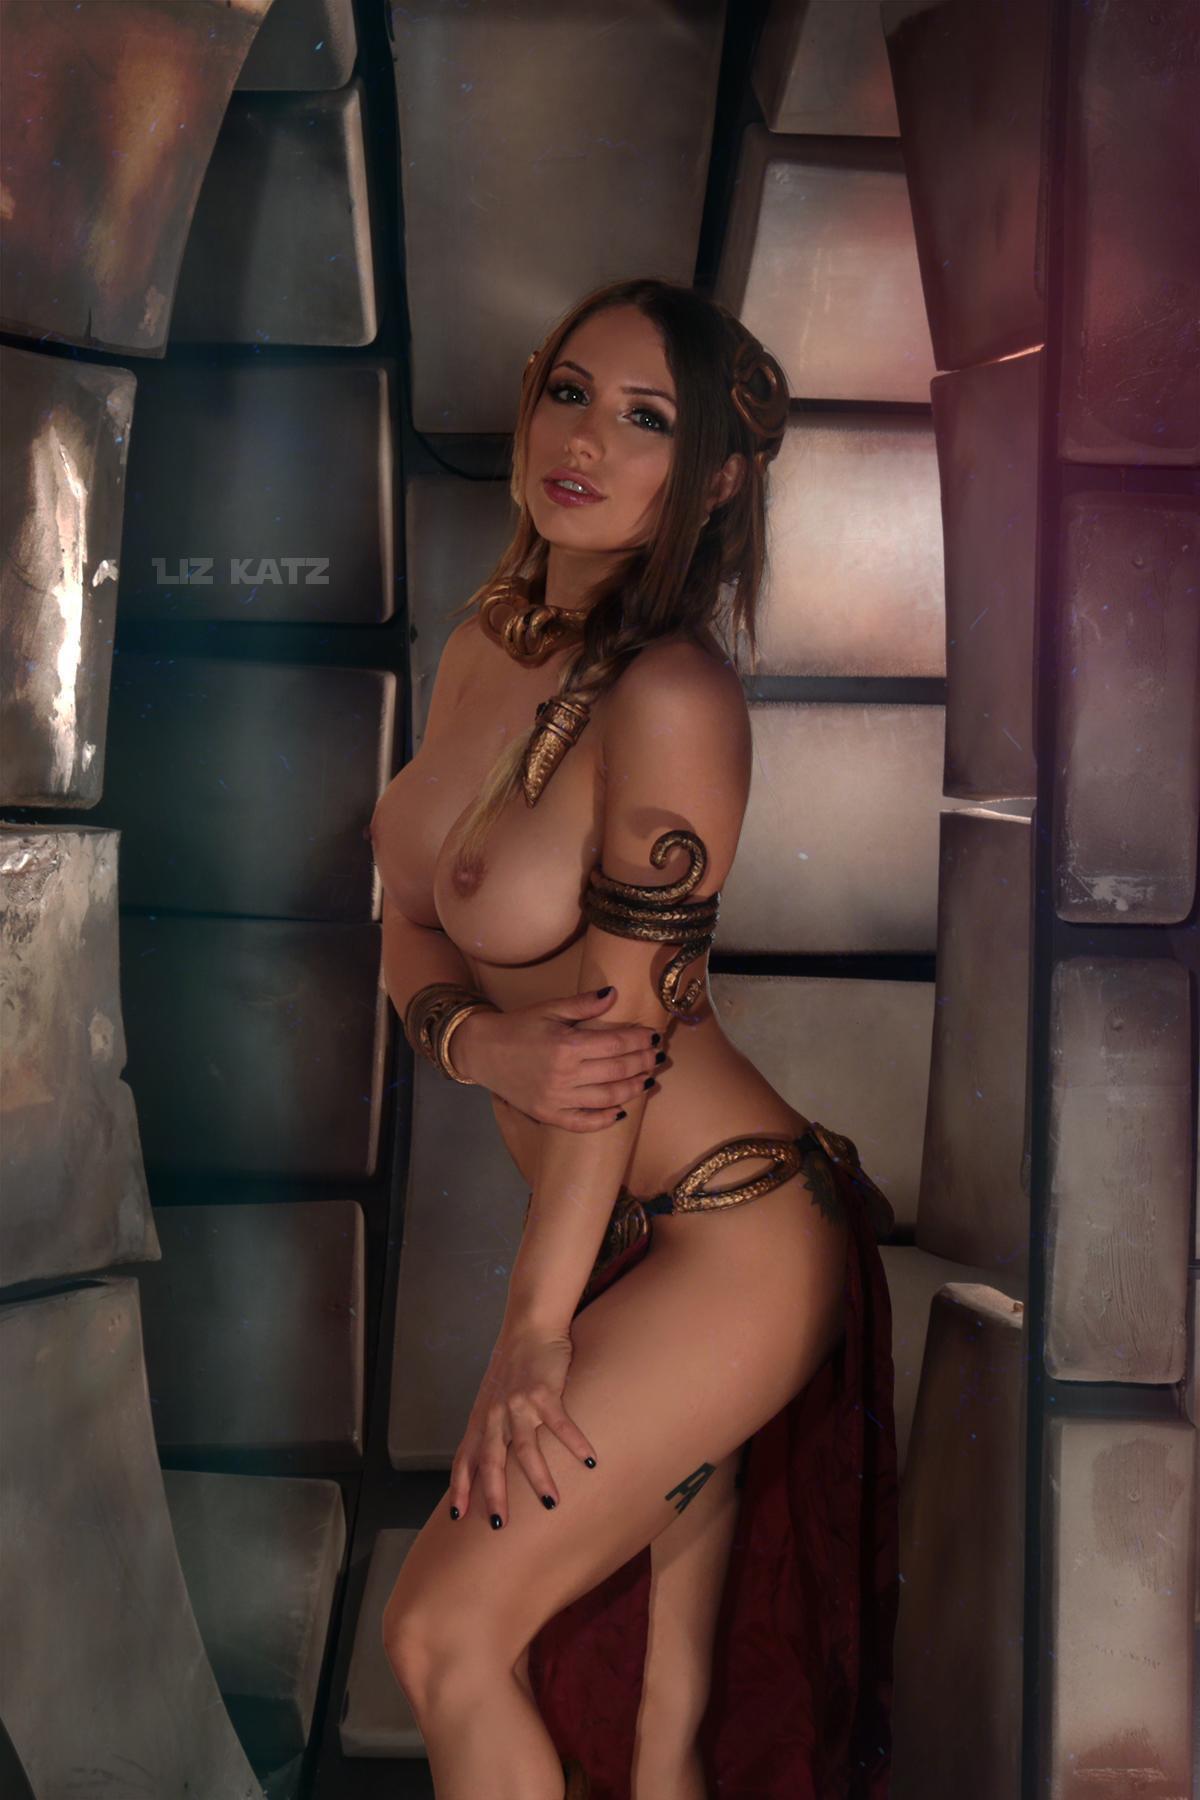 Liz Katz Slave Leia Nude Cosplay Onlyfans Leaked Photos 18